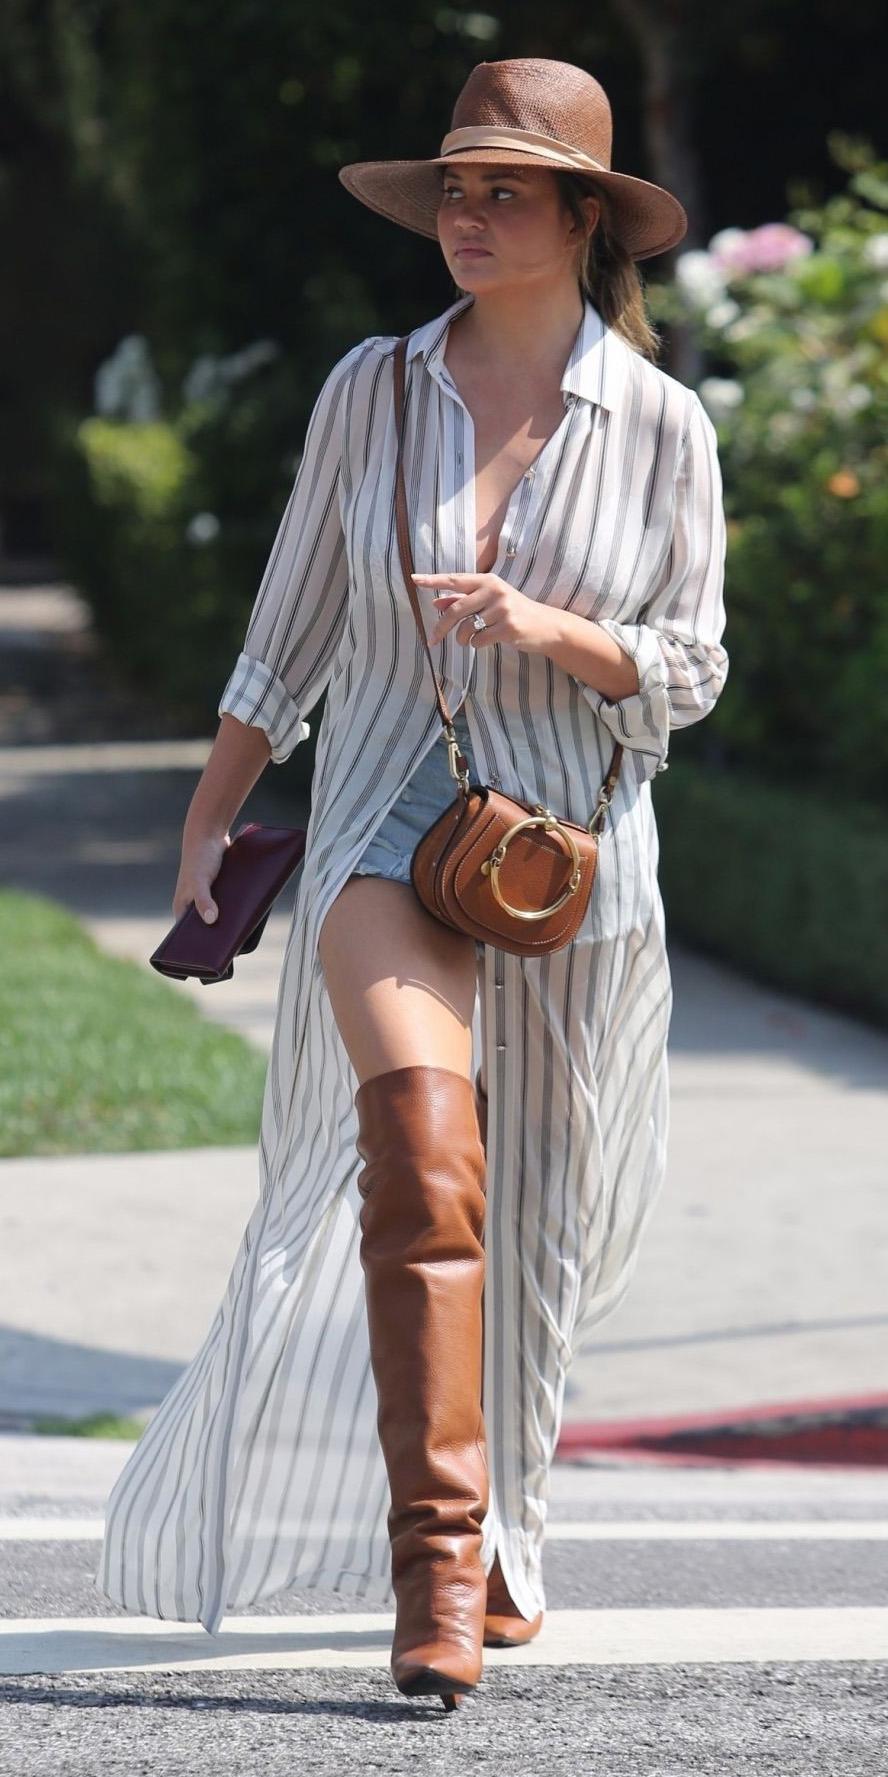 how-to-style-blue-light-shorts-cognac-shoe-boots-otk-cognac-bag-hairr-chrissyteigen-hat-vertical-stripe-white-collared-shirt-white-dress-shirt-fall-winter-fashion-weekend.jpg